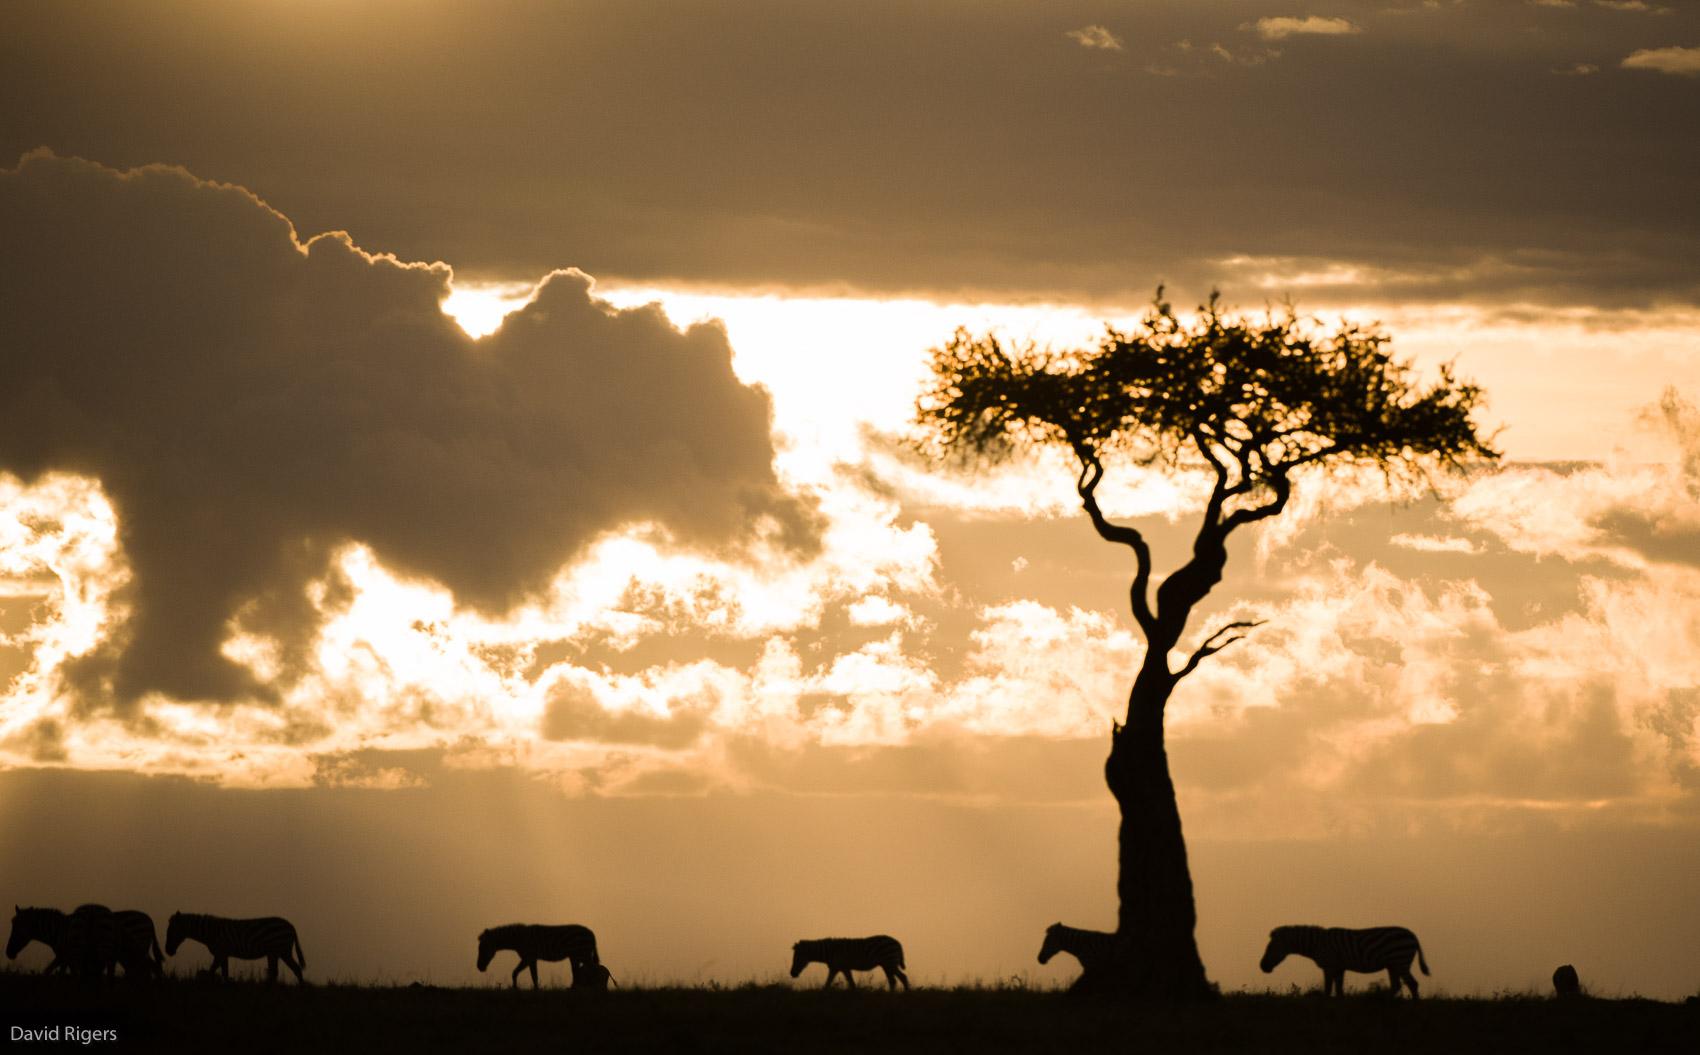 Kenya, Masai Mara National Park, Silhouettes of animals walking in the wild. ©David Rogers